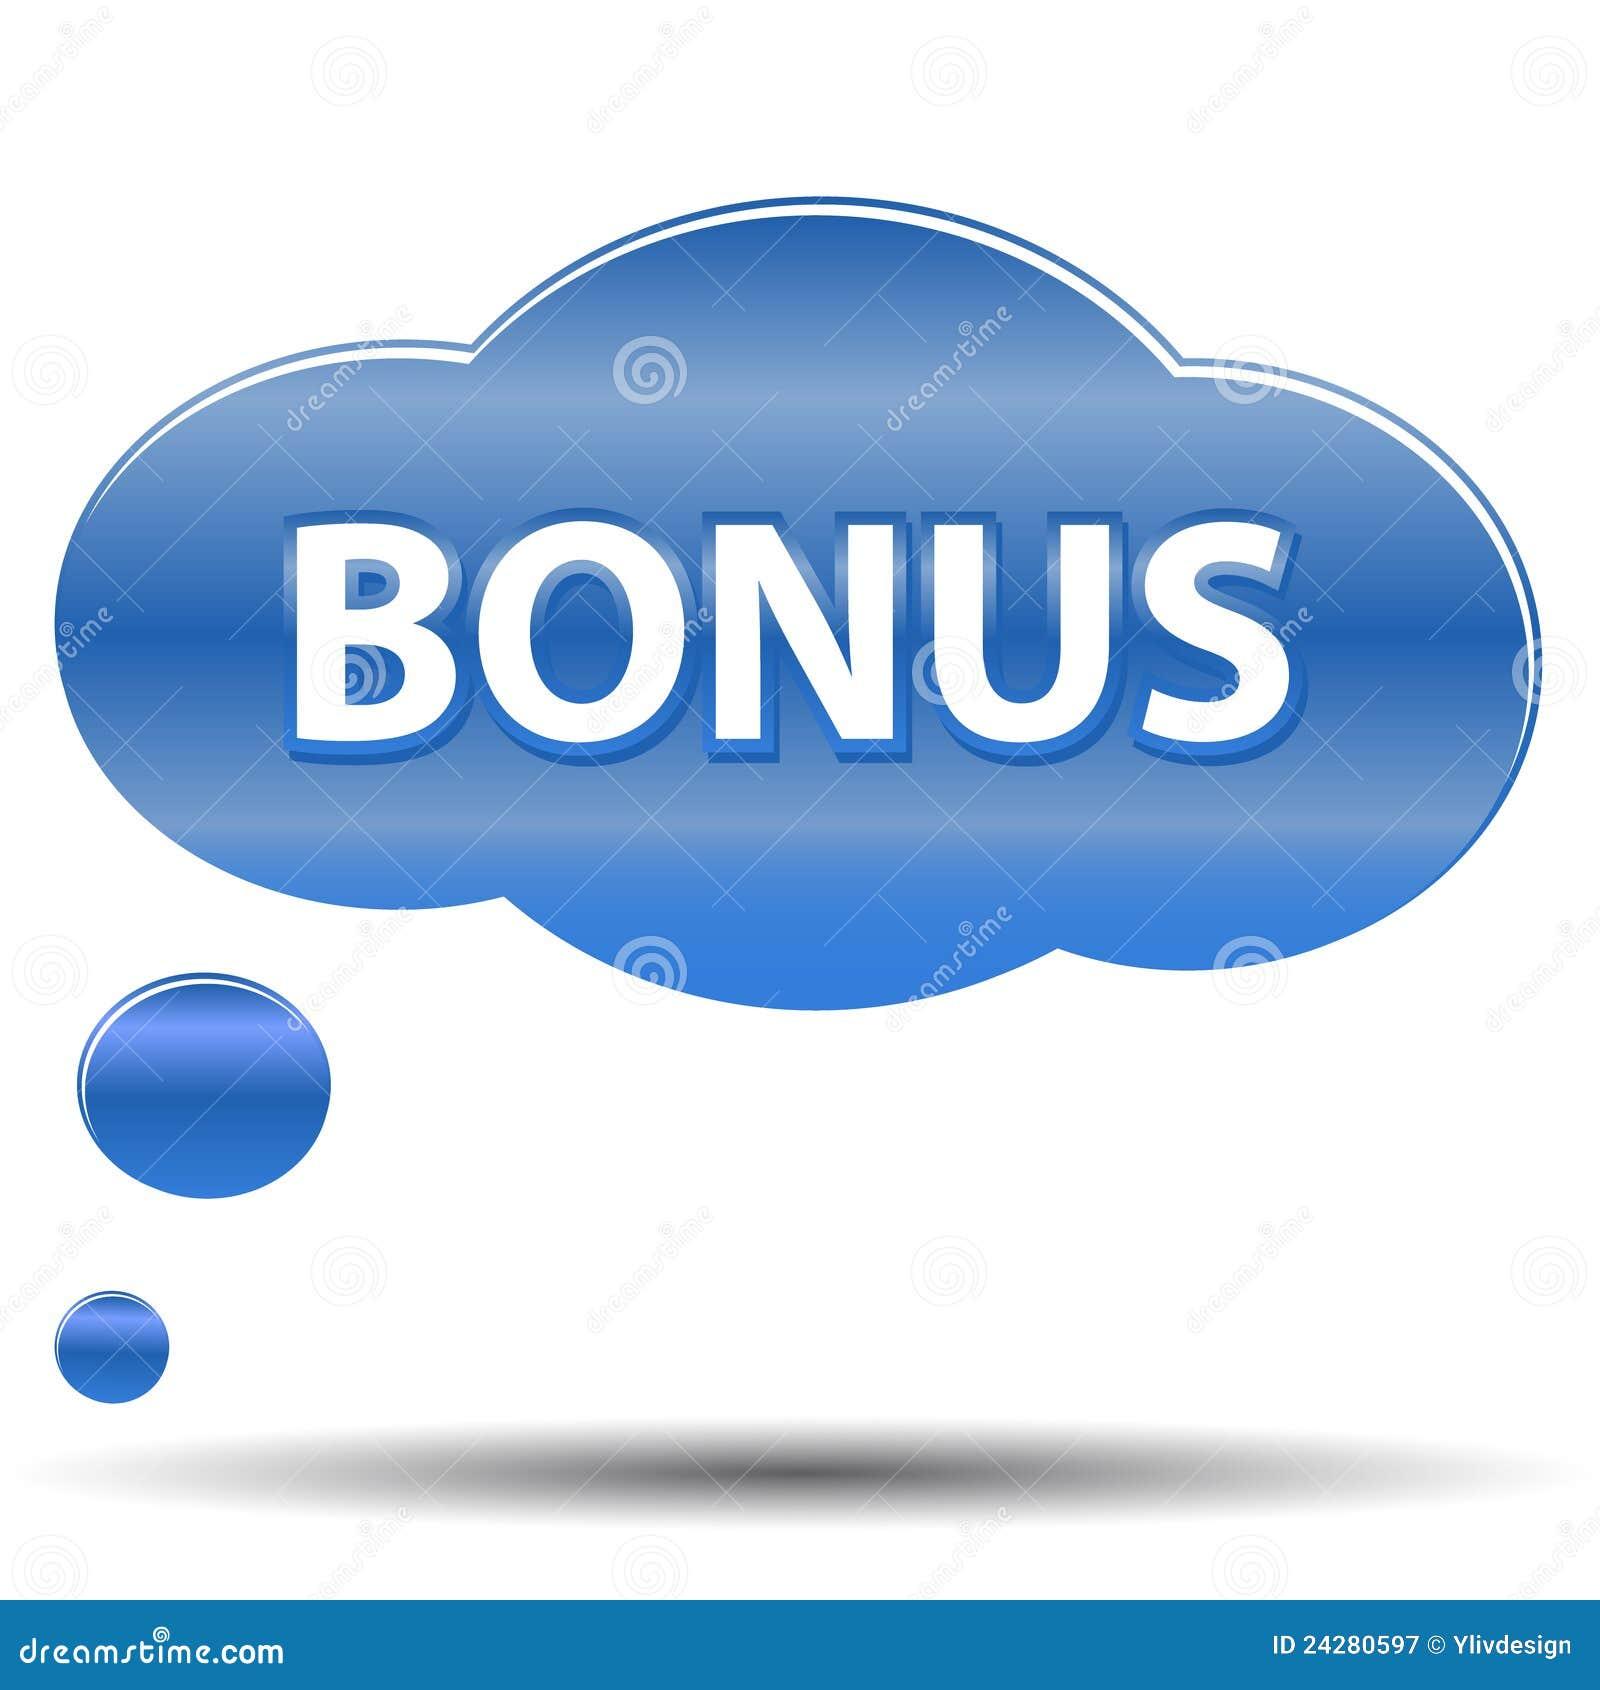 super aces bonus strategy horse